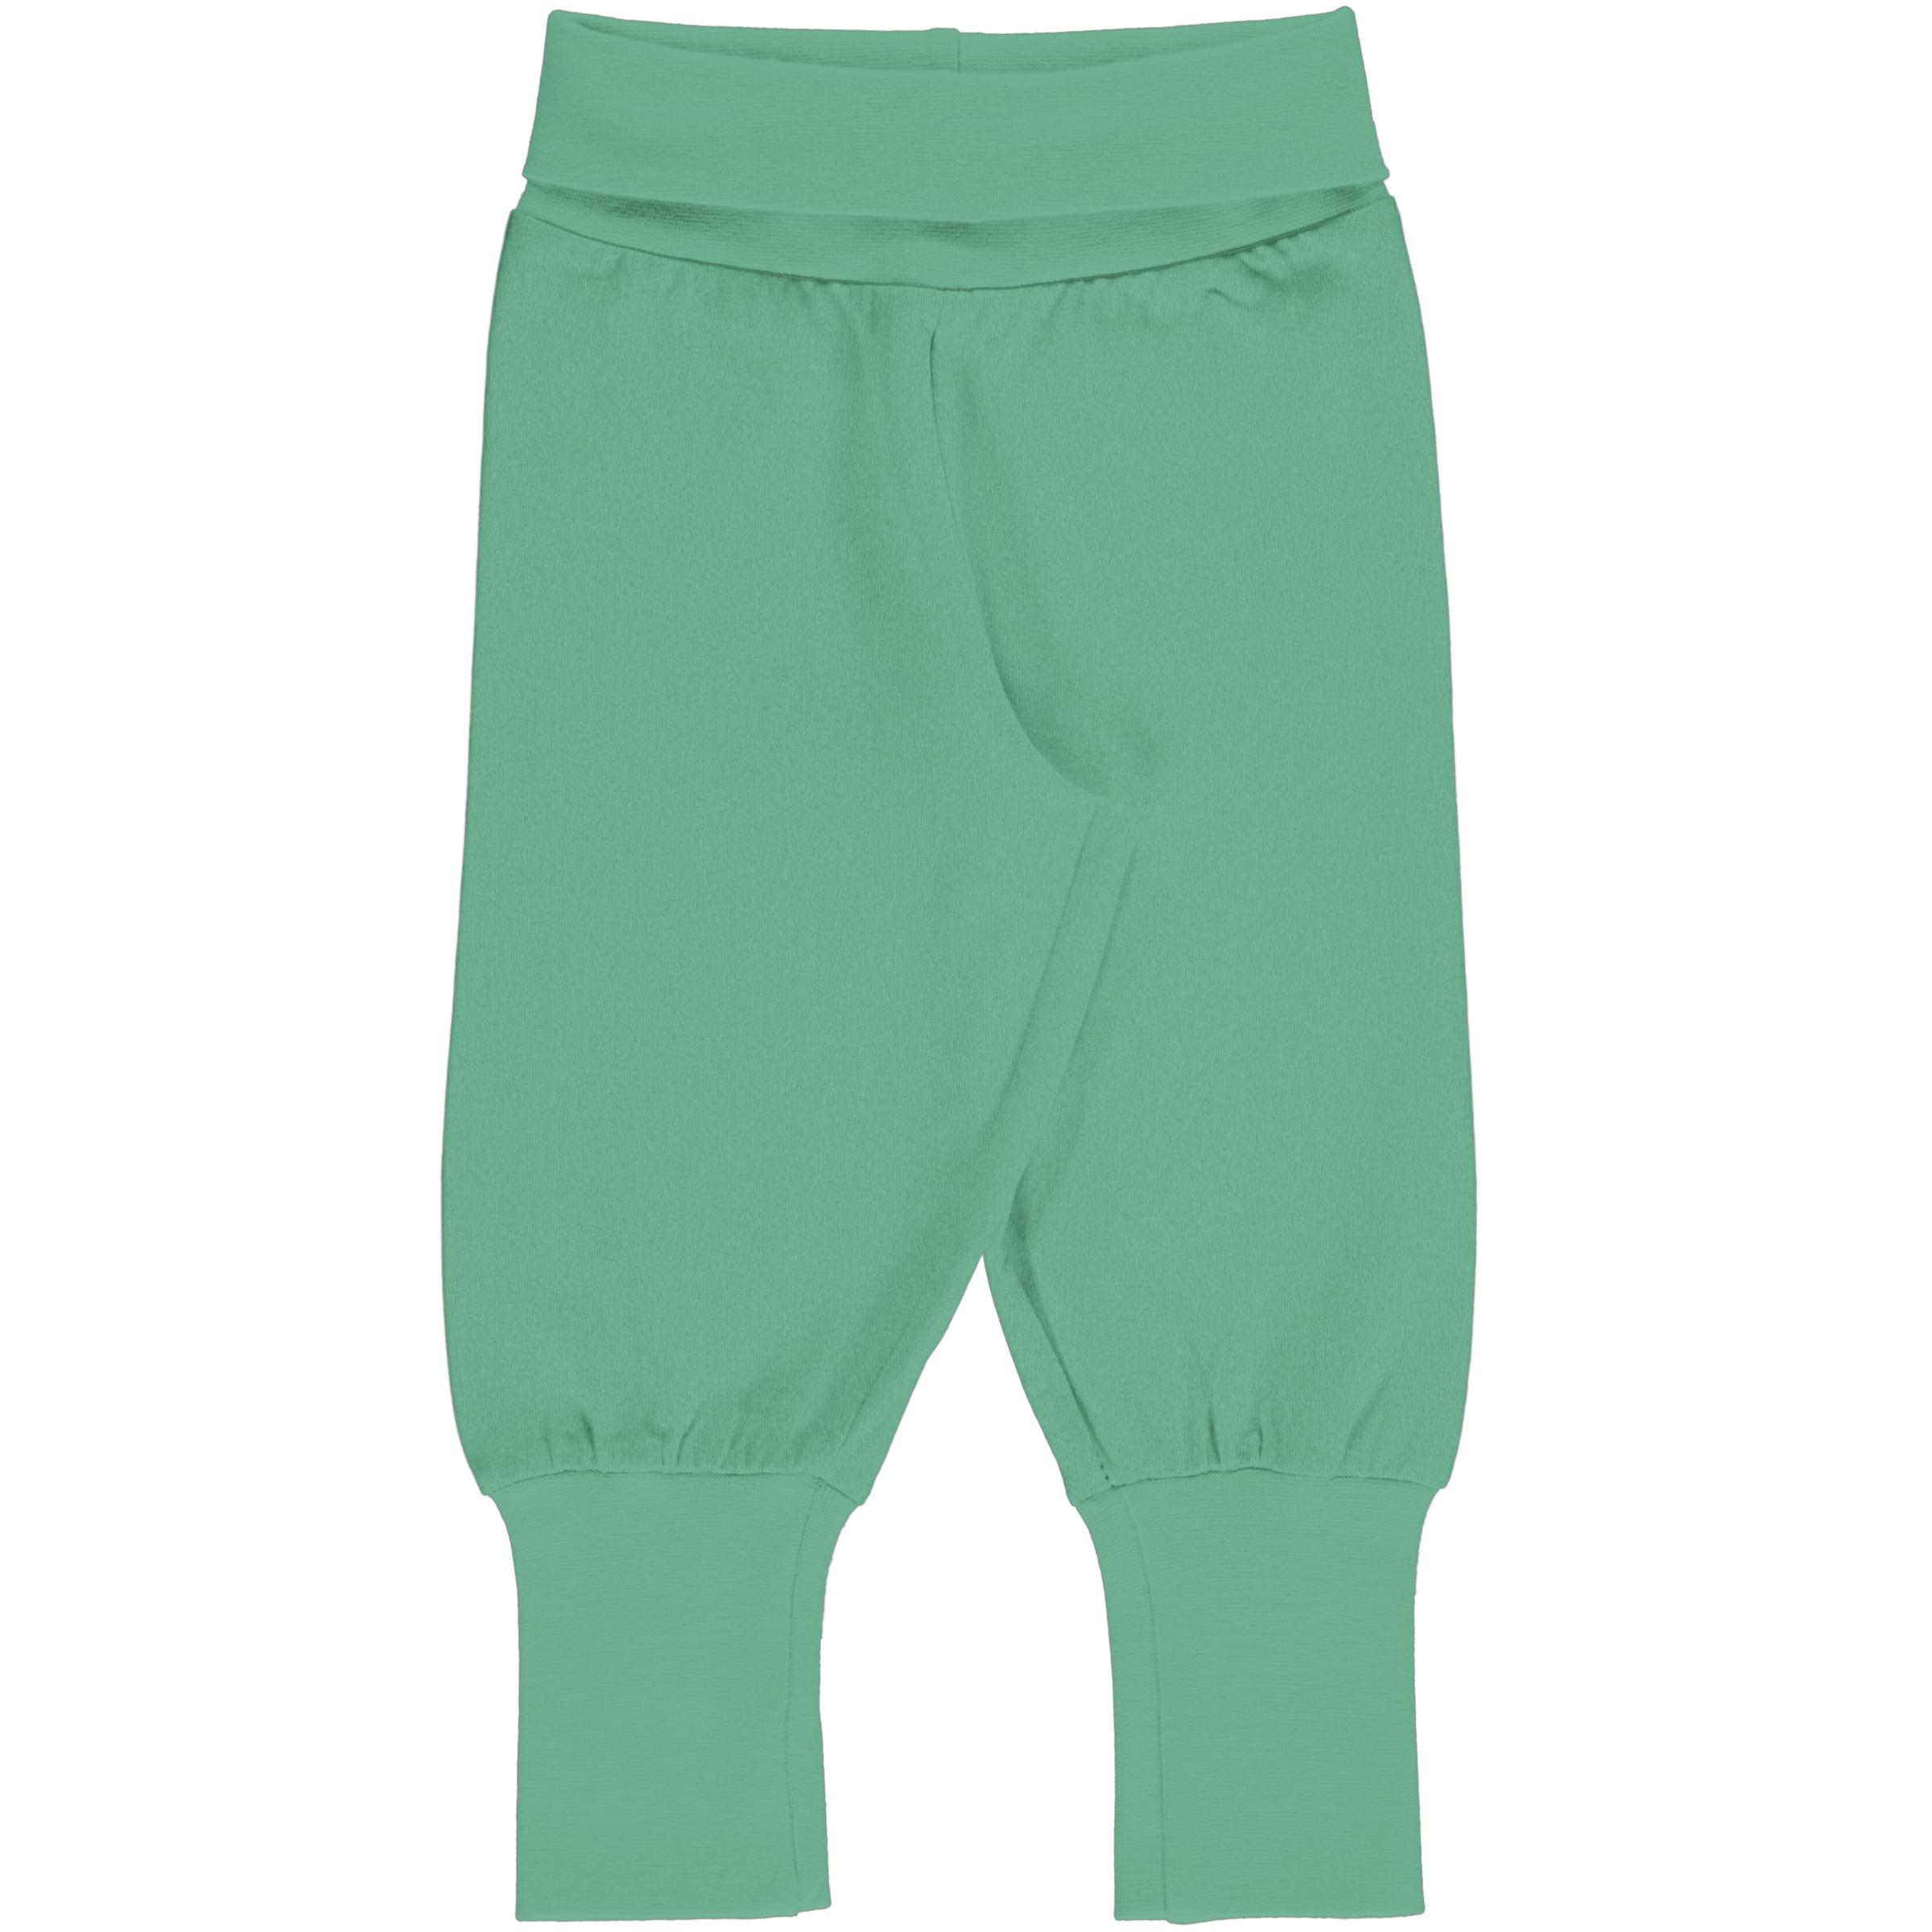 Meyadey by Maxomorra Baby Rib Pants Solid CASCADE 074/080